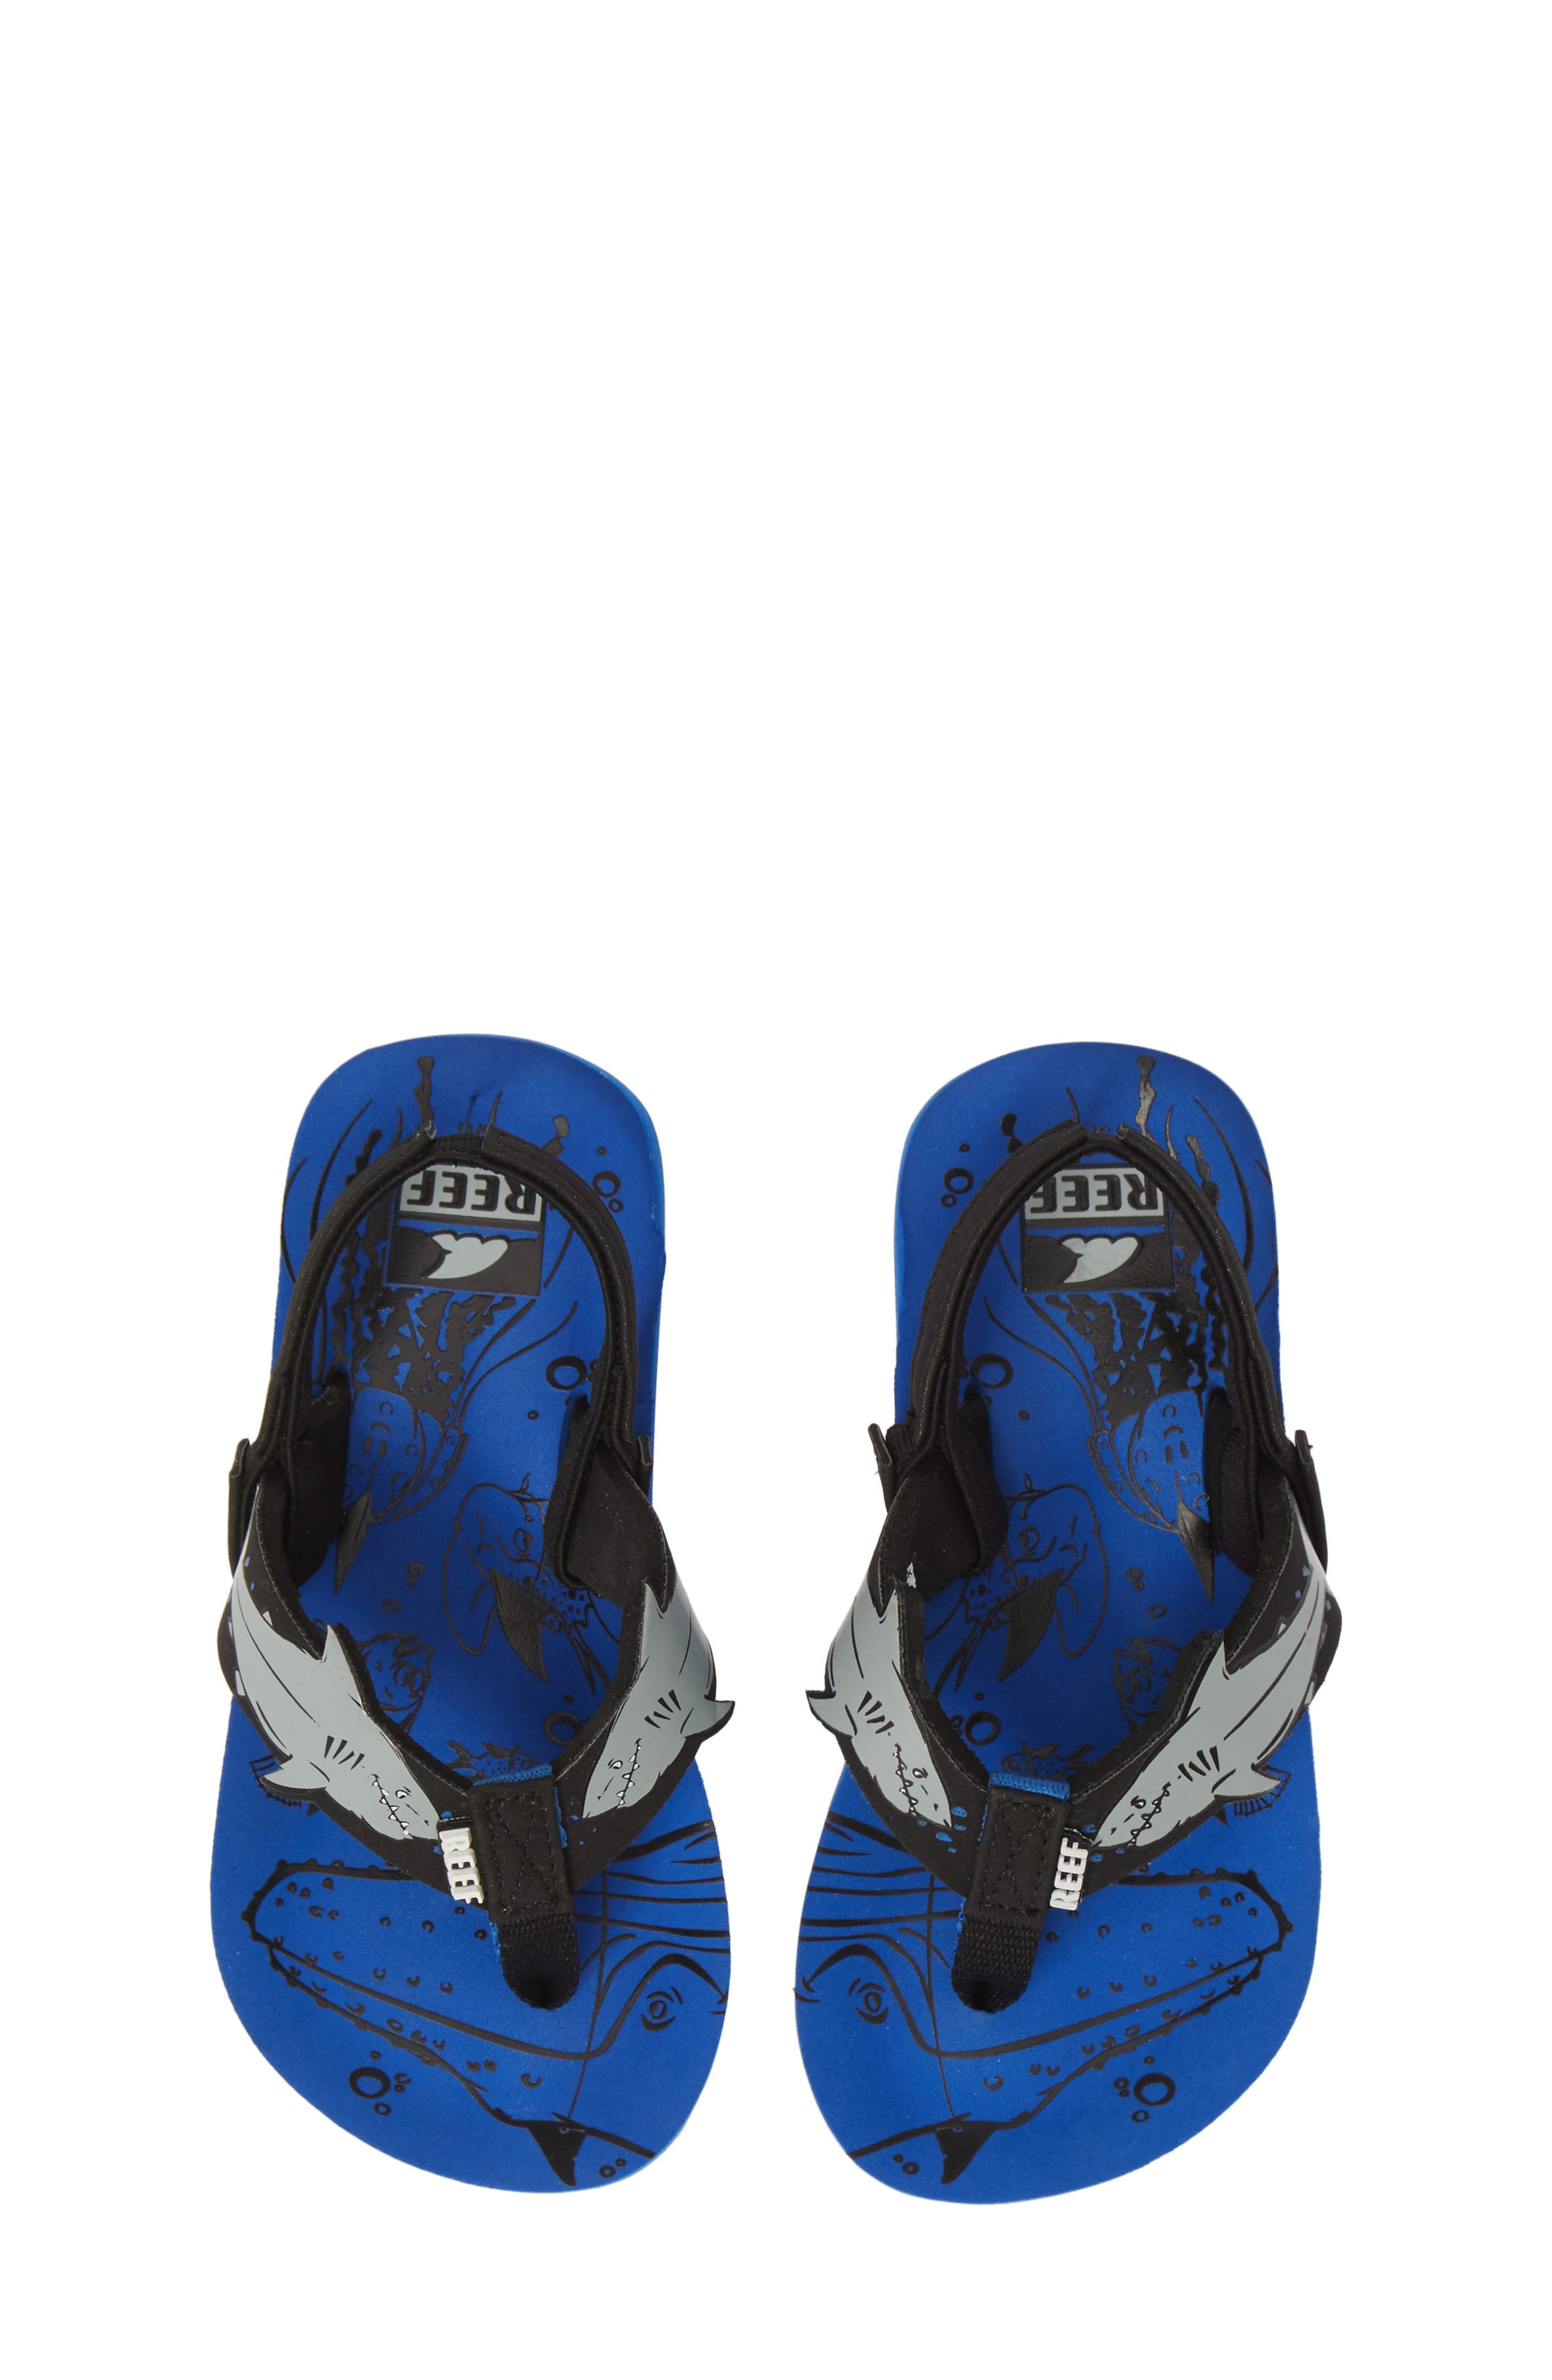 REEF, Ahi Shark Flip Flop, Main thumbnail 1, color, BLUE